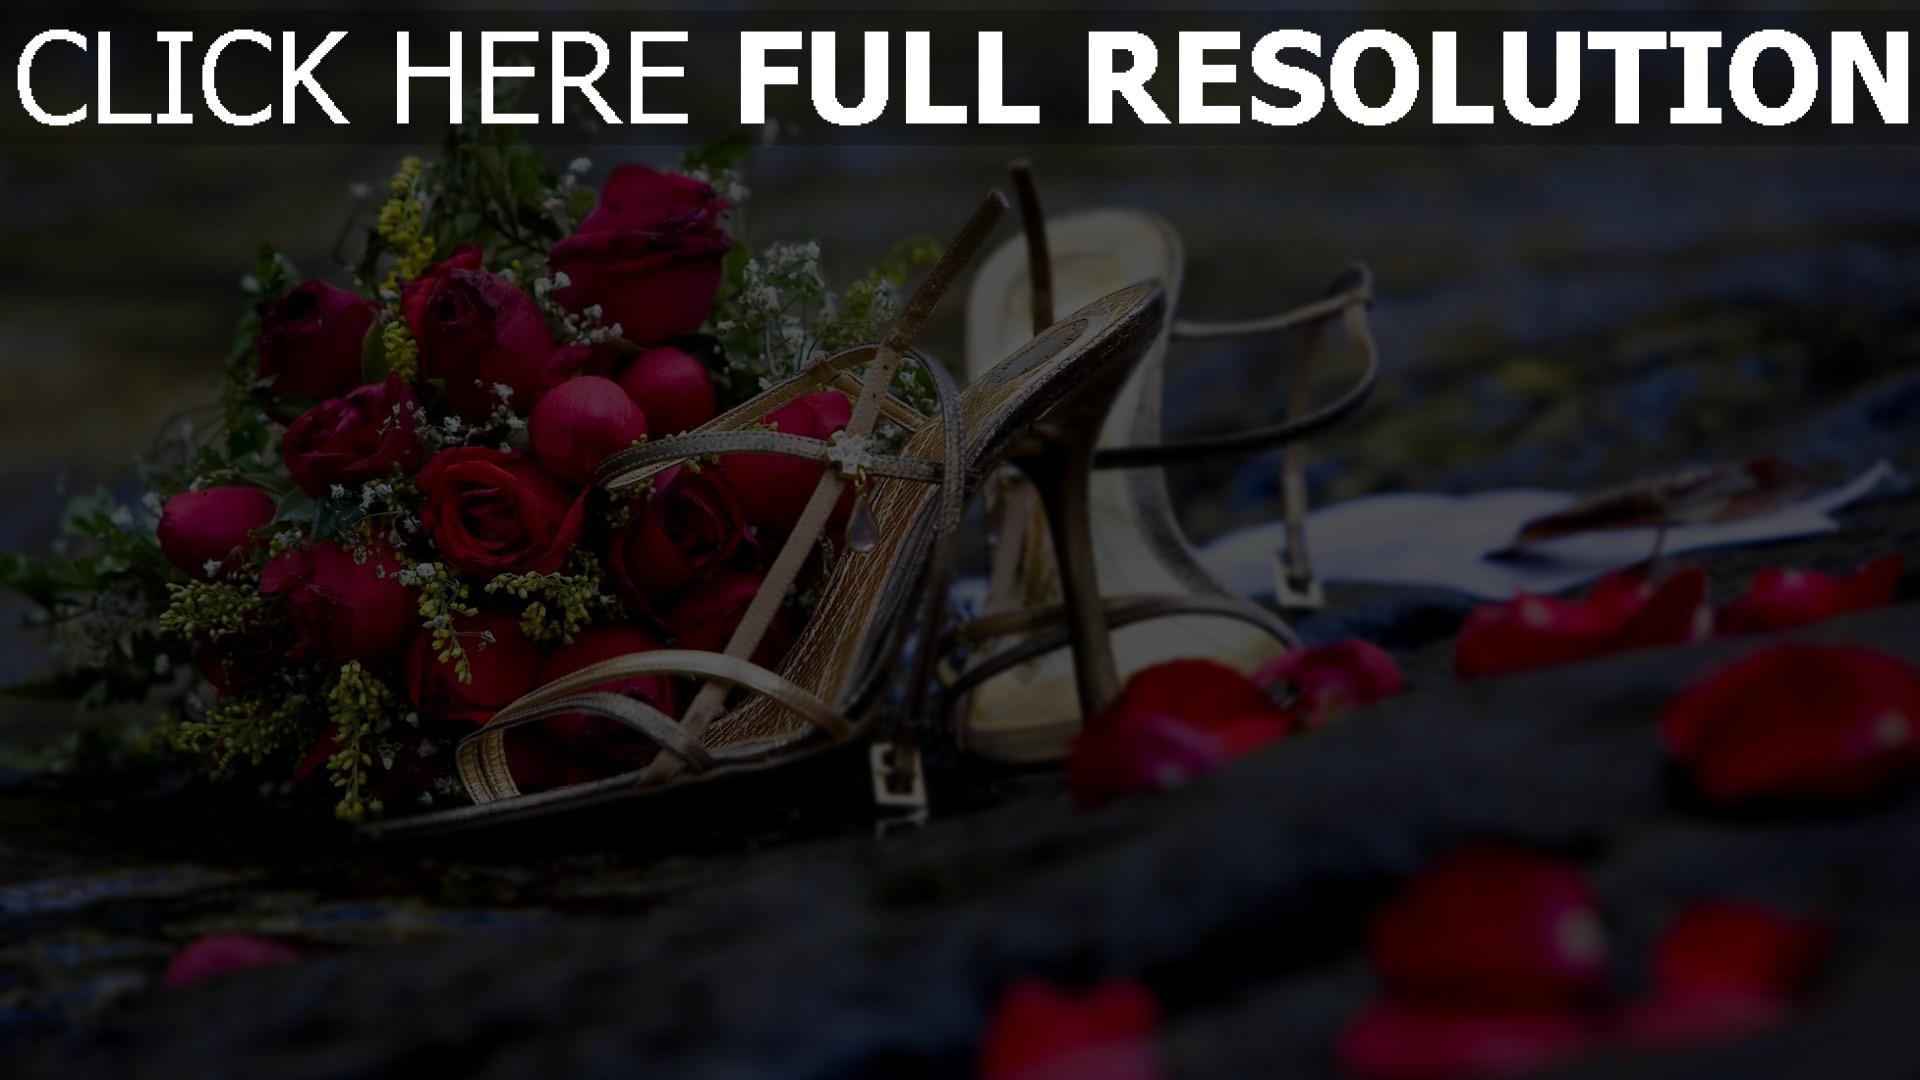 hd hintergrundbilder strauß rosen rot schuhe blütenblätter 1920x1080